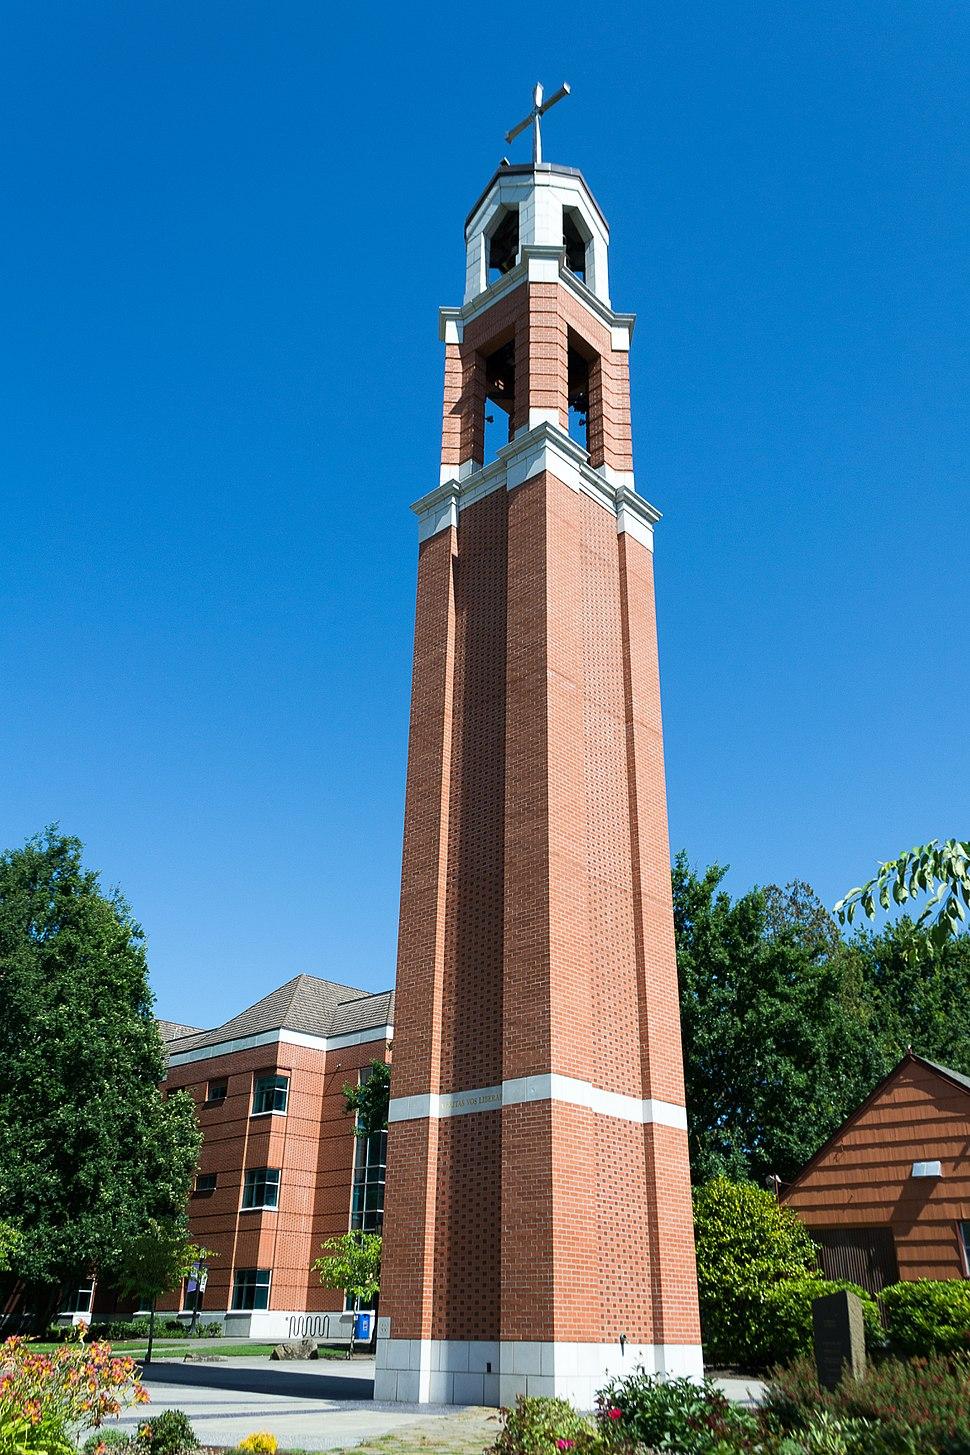 Bell Tower (University of Portland)